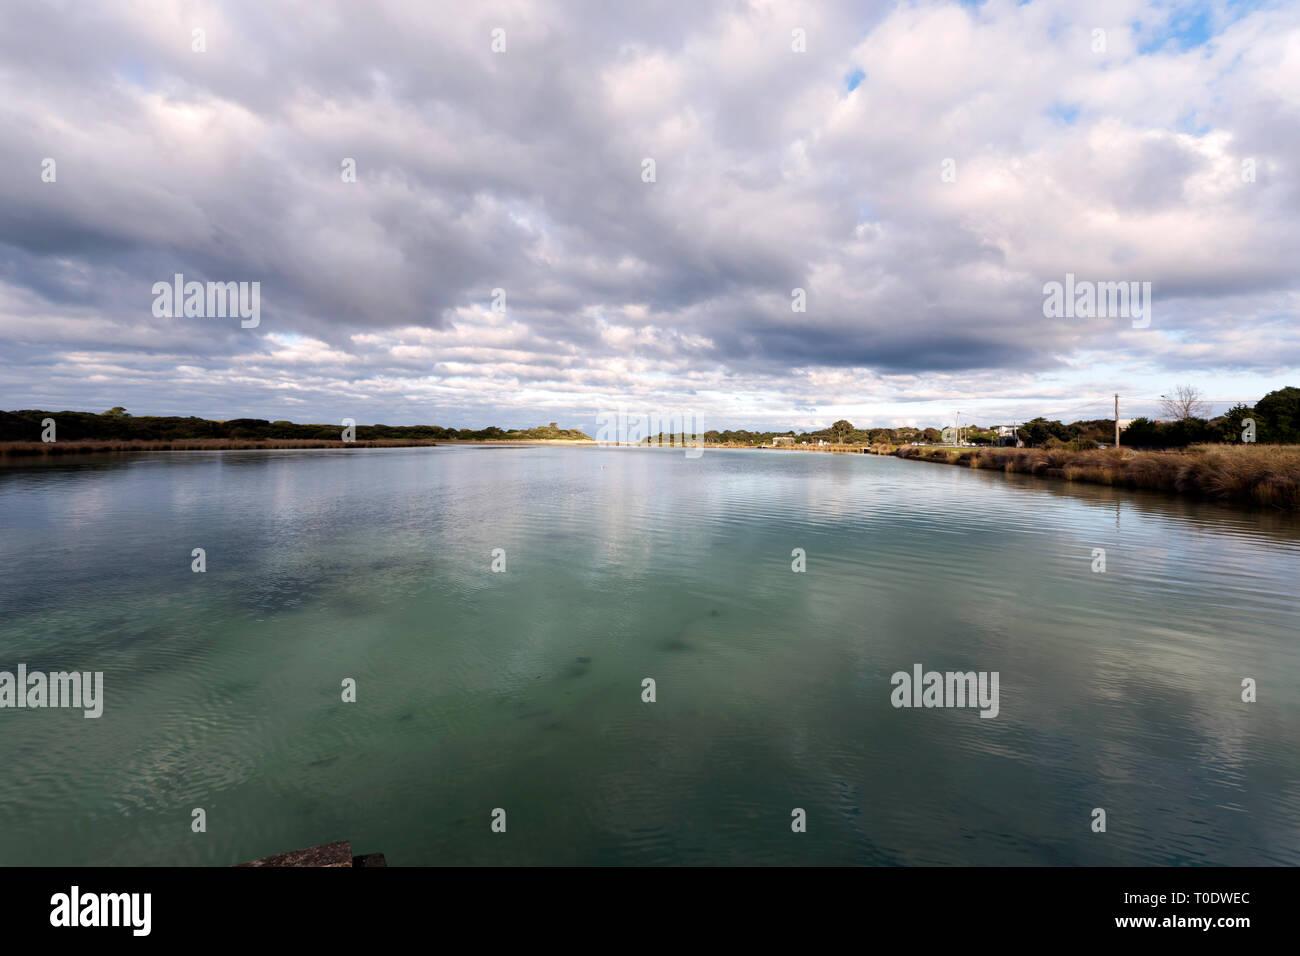 Estuarine lake,  Anglesea on the Great Ocean Road, Victoria, Australia - Stock Image